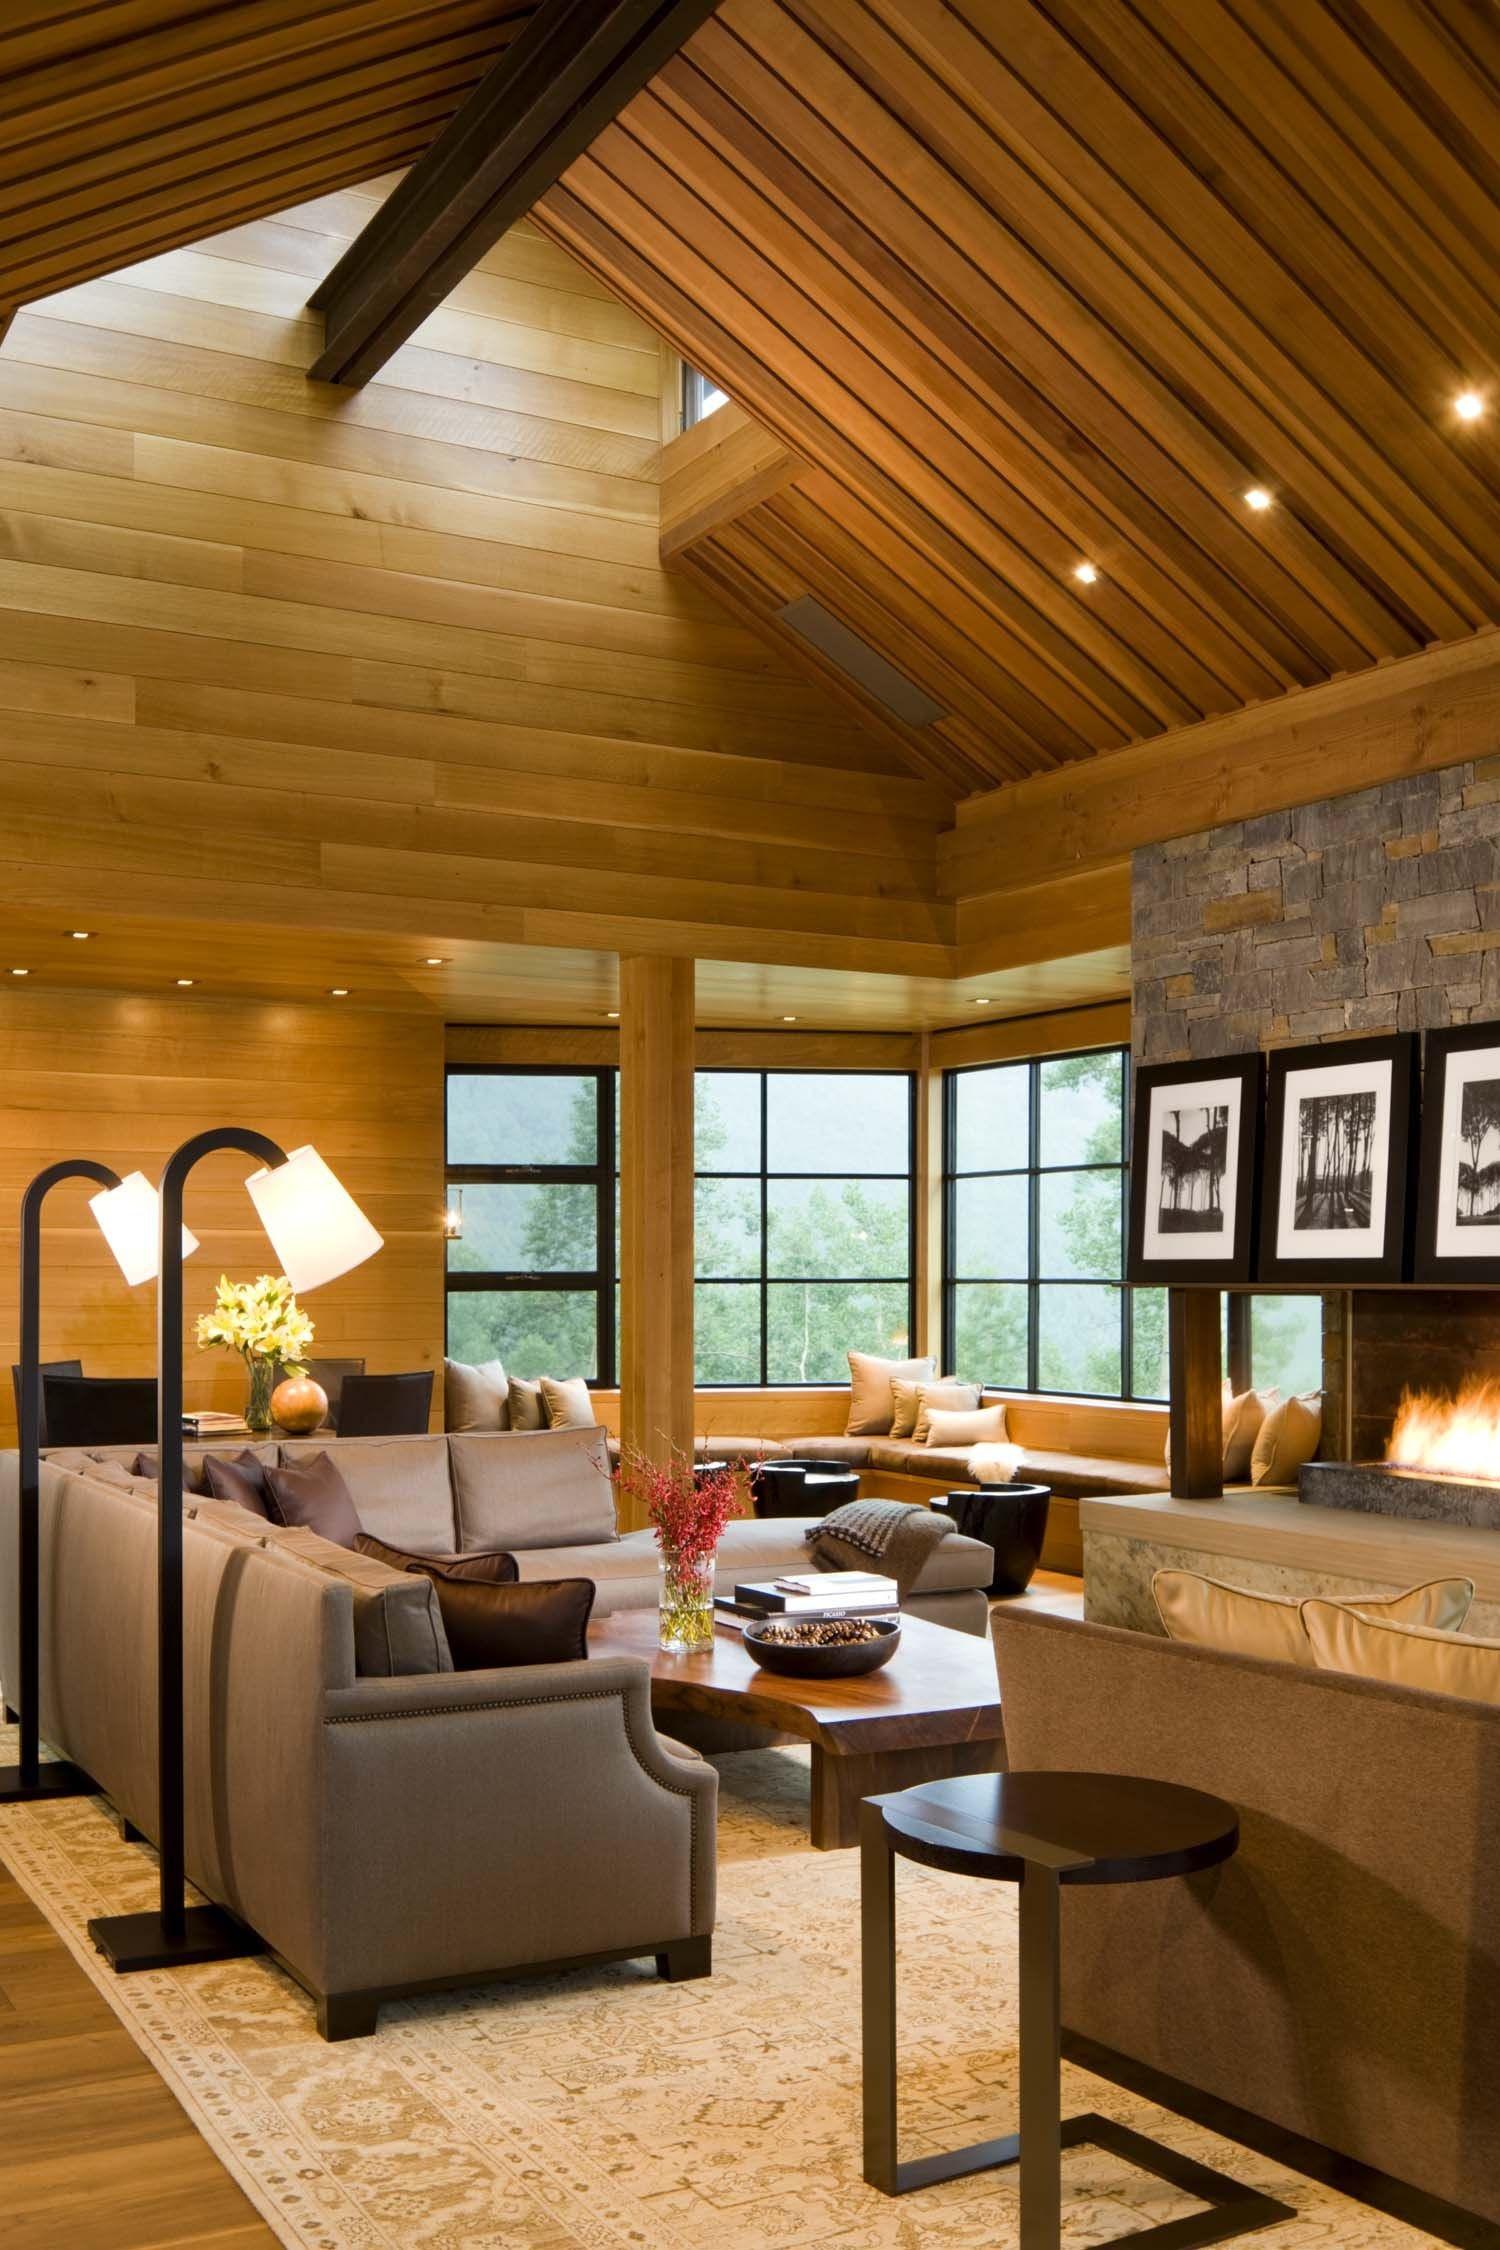 Vaulted Living Room Ideas - HomesFeed